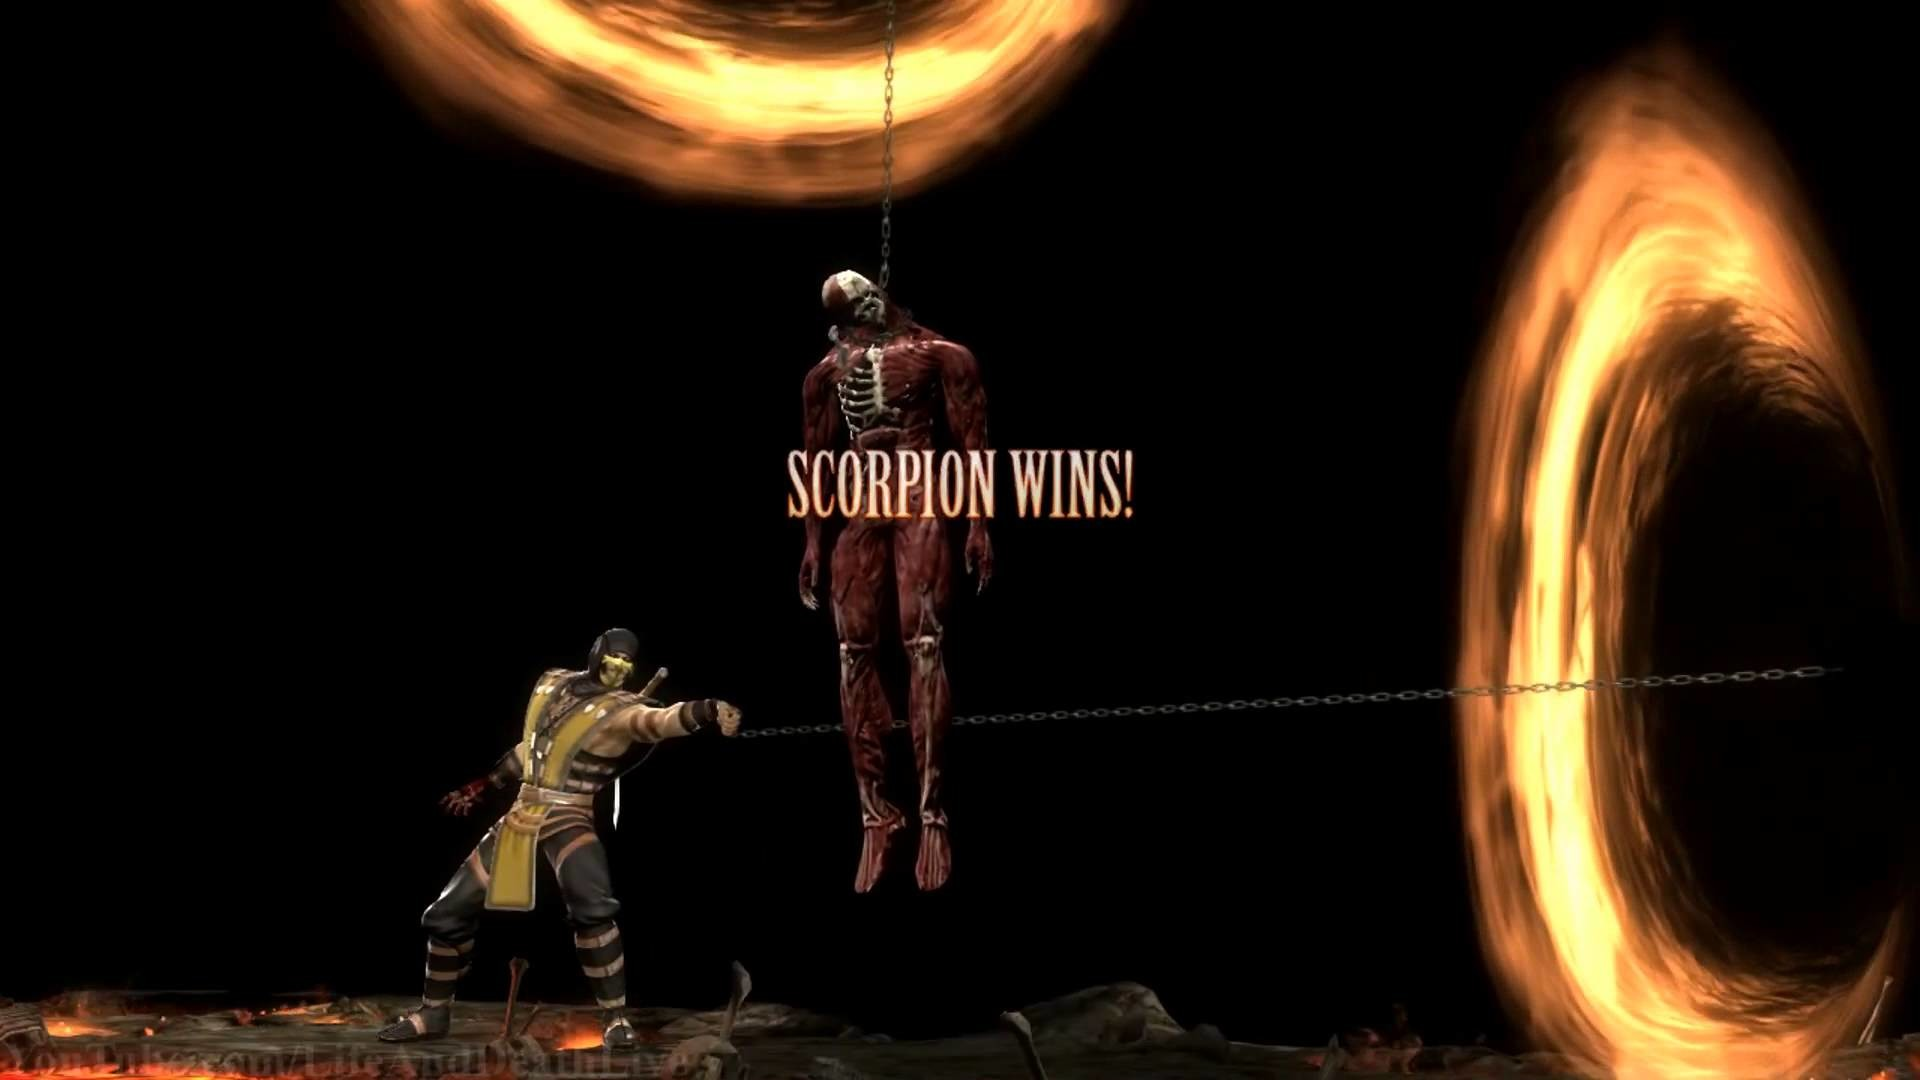 Mortal Kombat X – Scorpion Costume / Skin PC Mod *MK9 Komplete Edition*  (HD) – YouTube